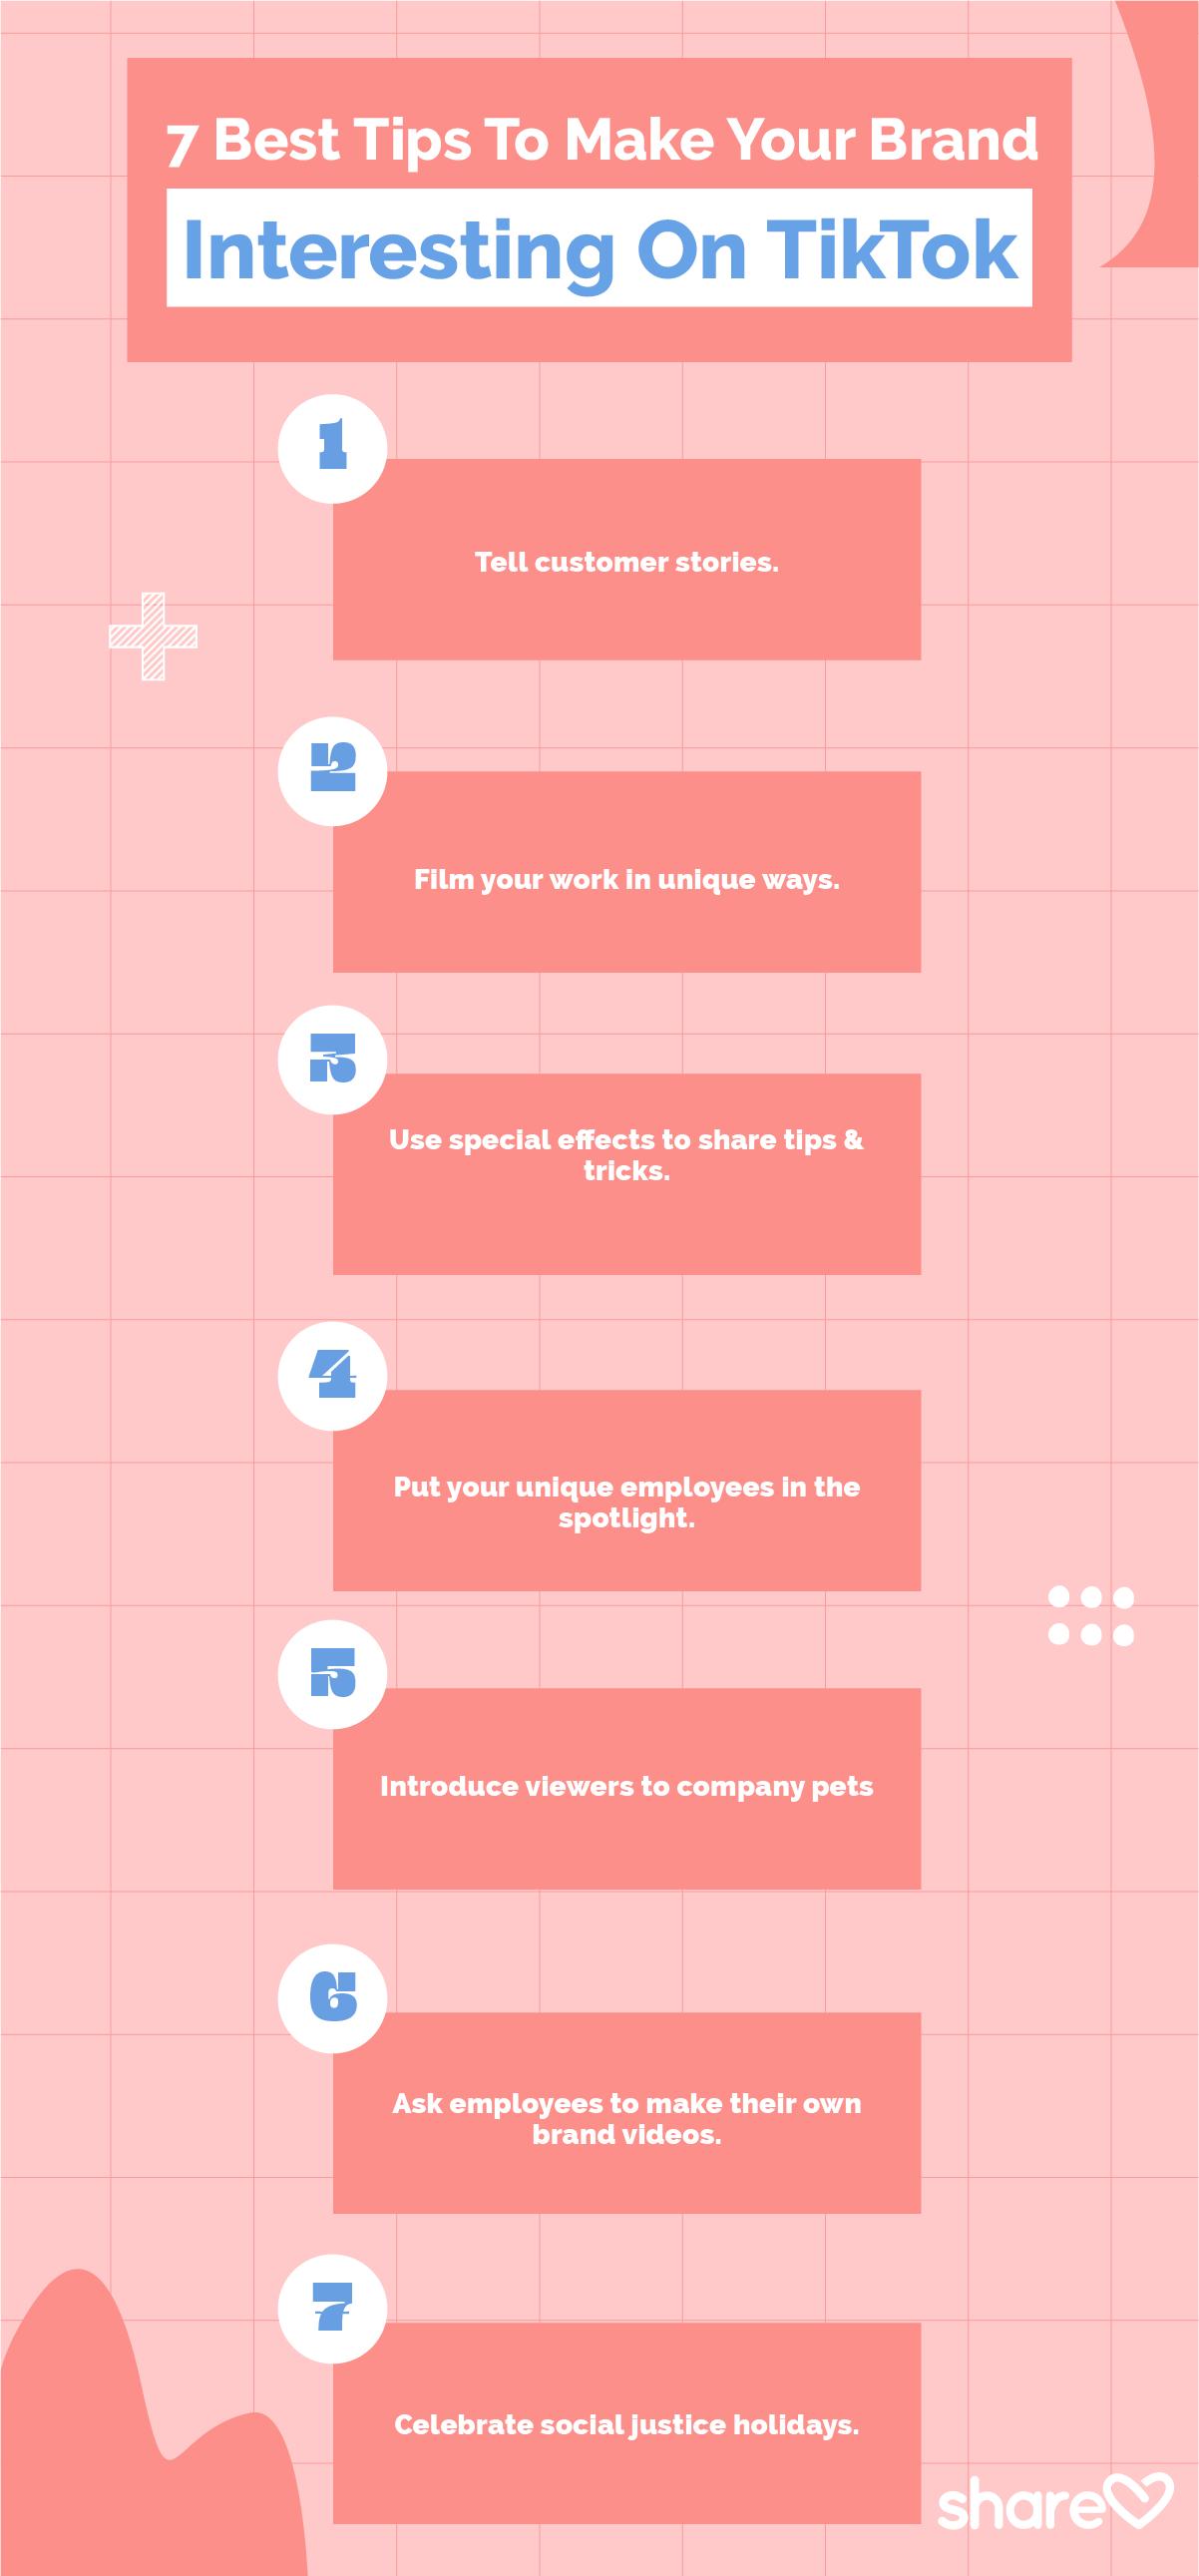 7 Tips To Make Your Brand Interesting On TikTok